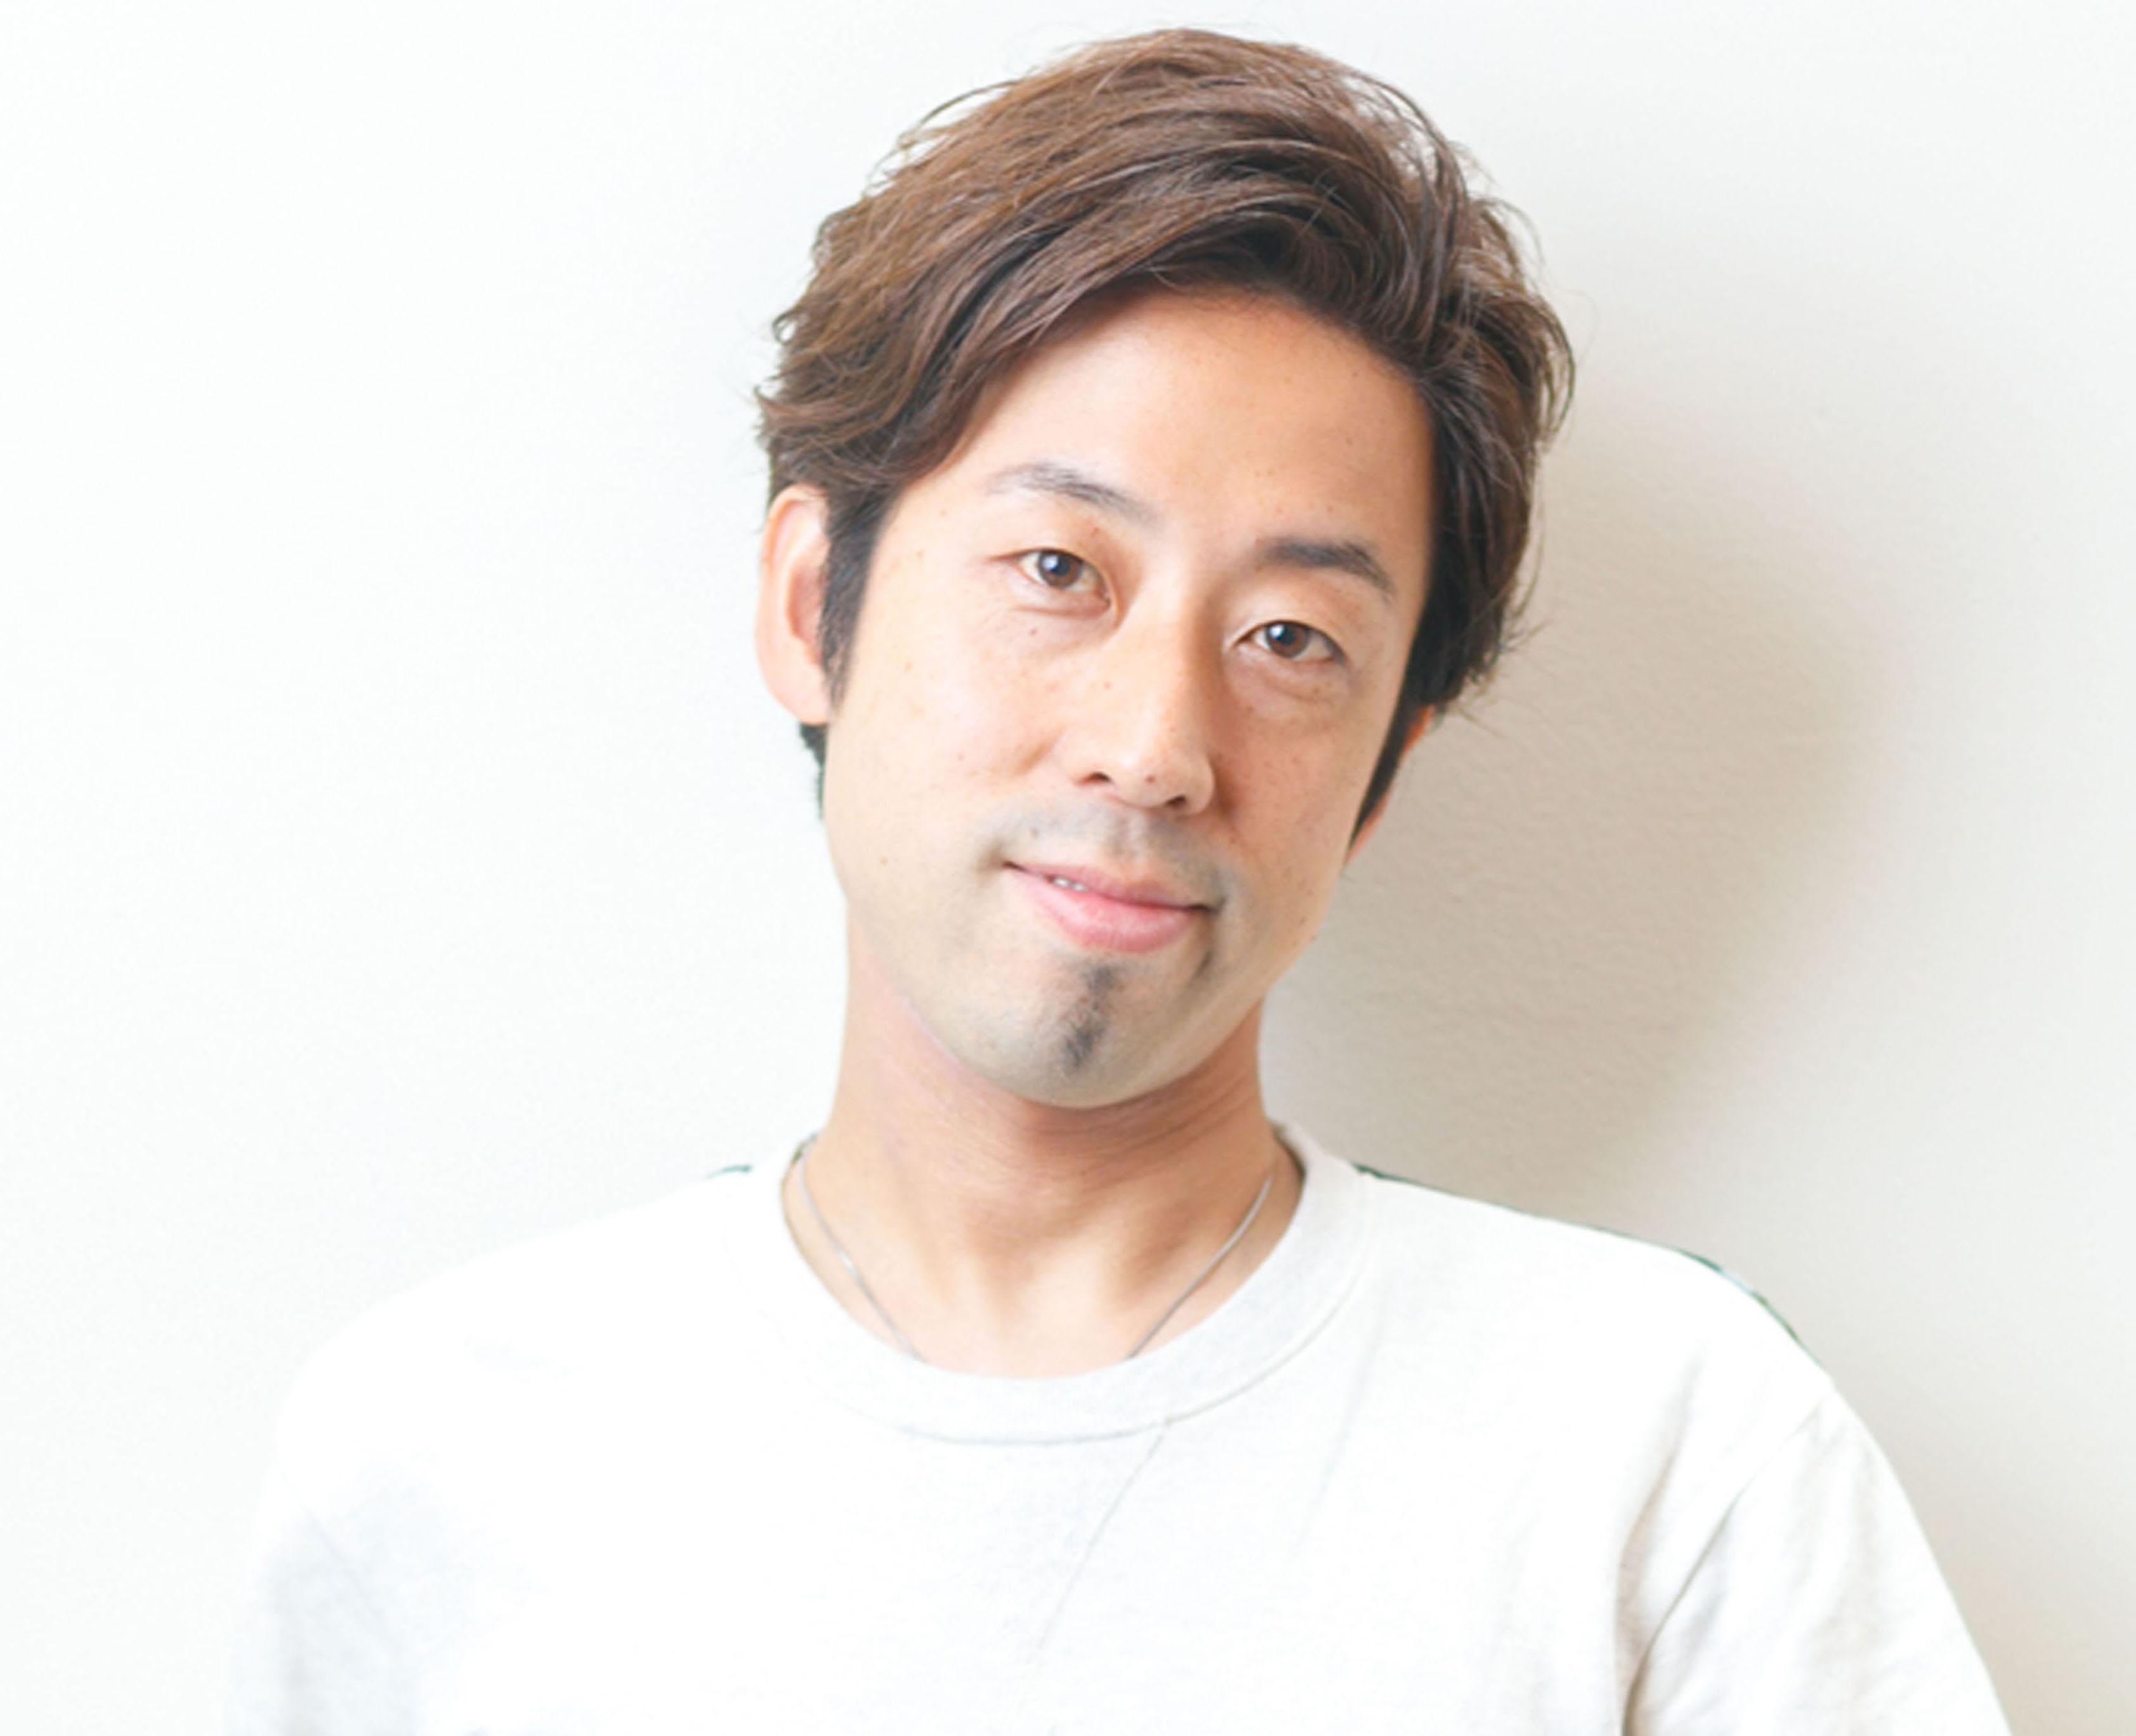 yoshihiroueno